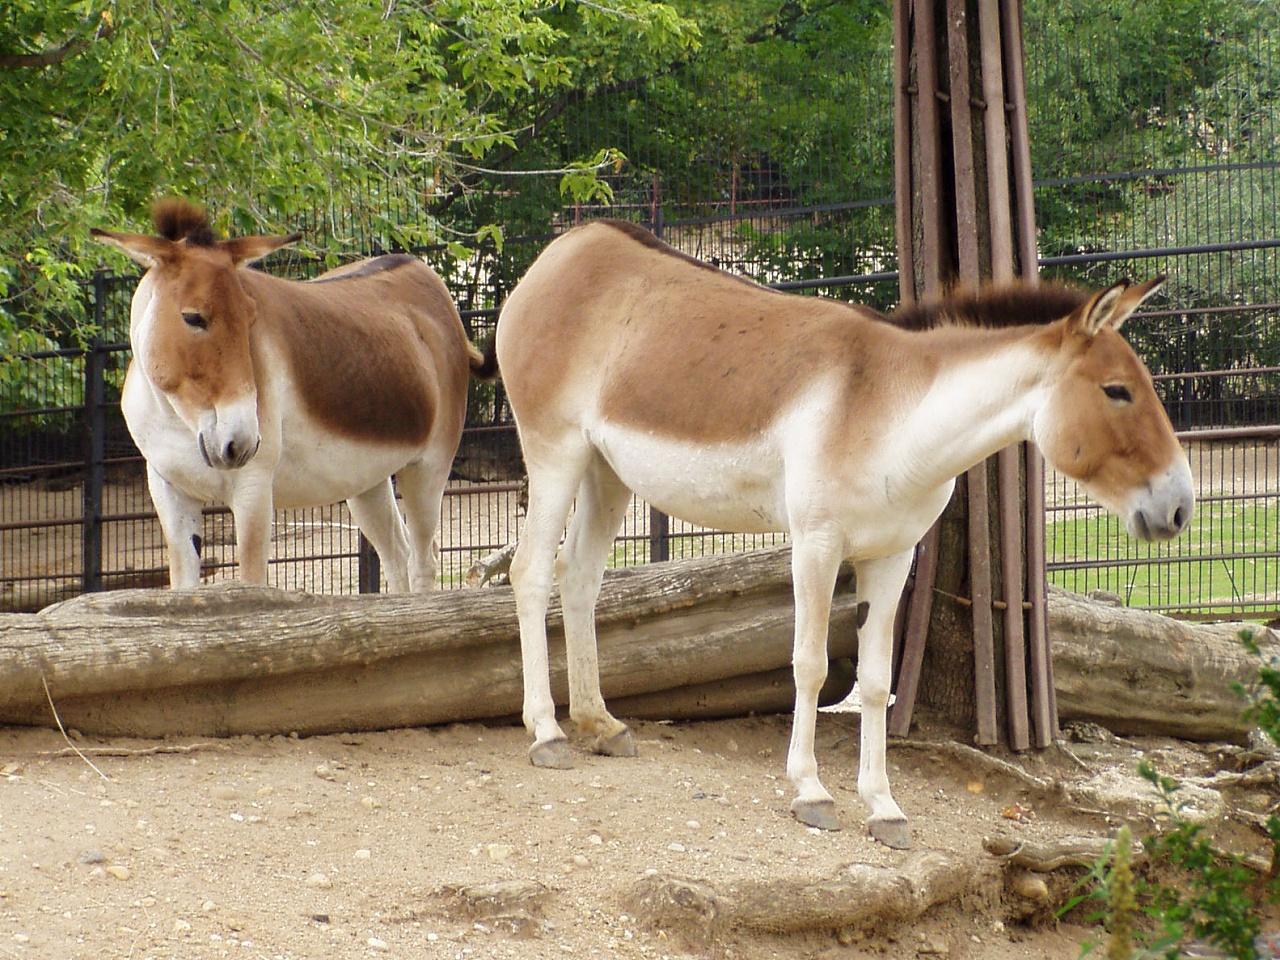 Kiang | The Life of Animals